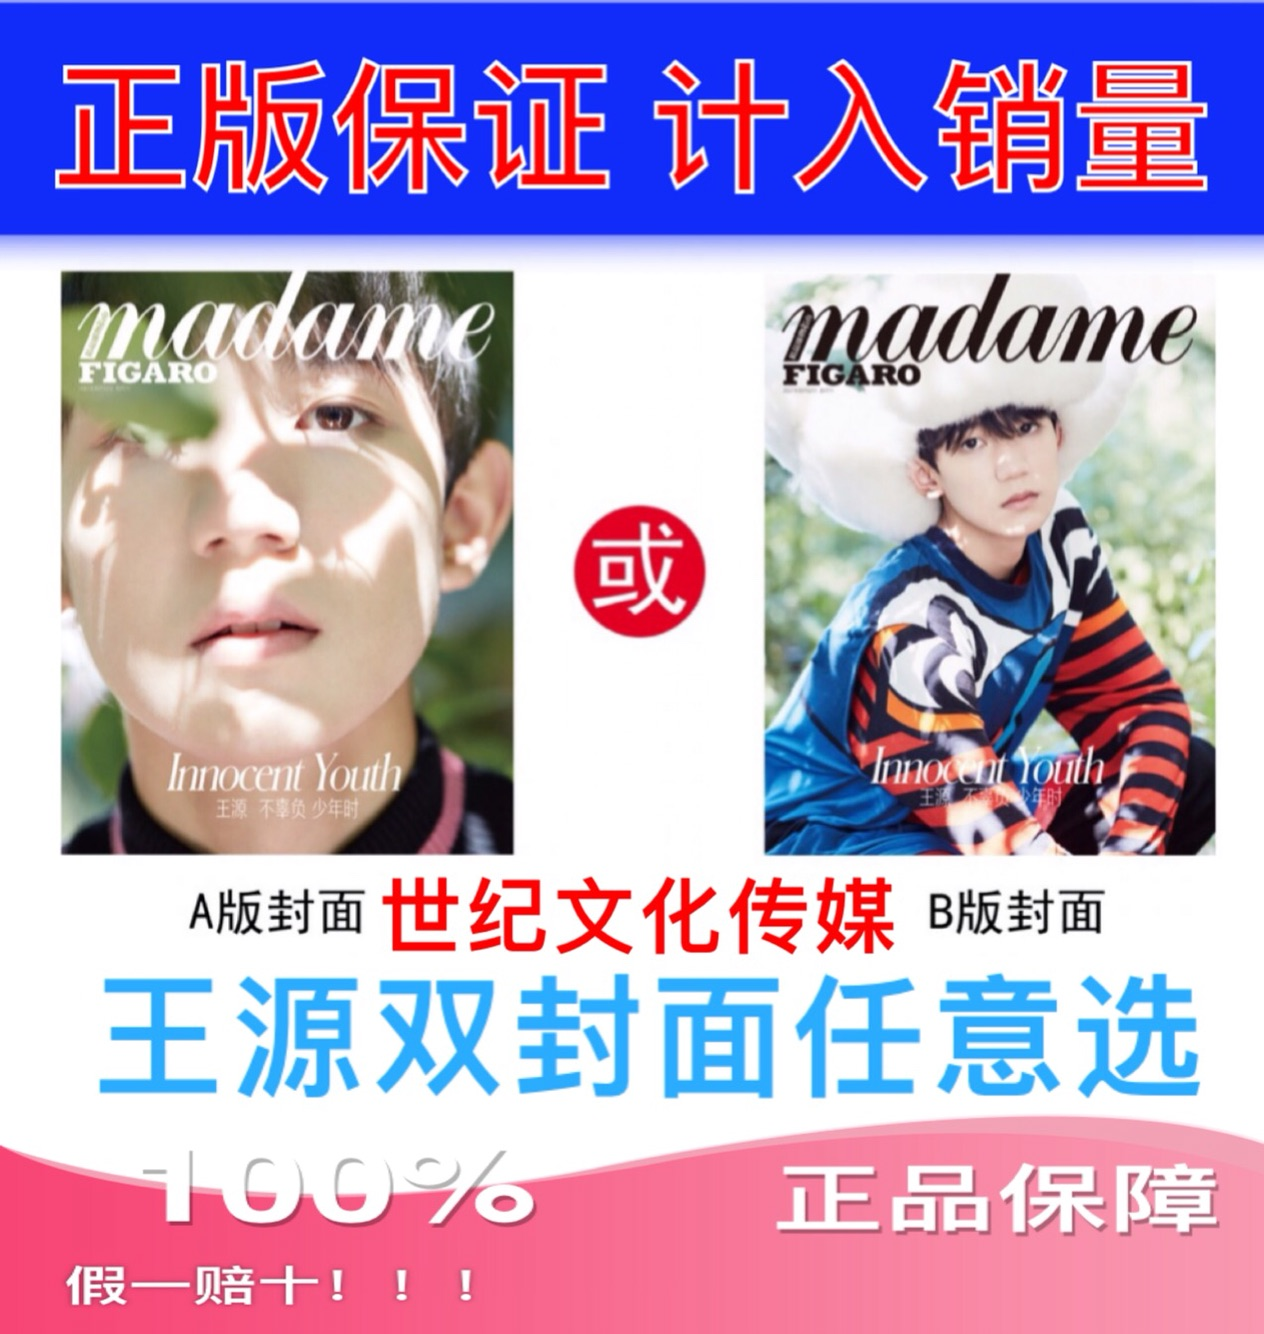 MadameFigaro王源限量珍藏版1米独家海报+特制筒盒+杂志